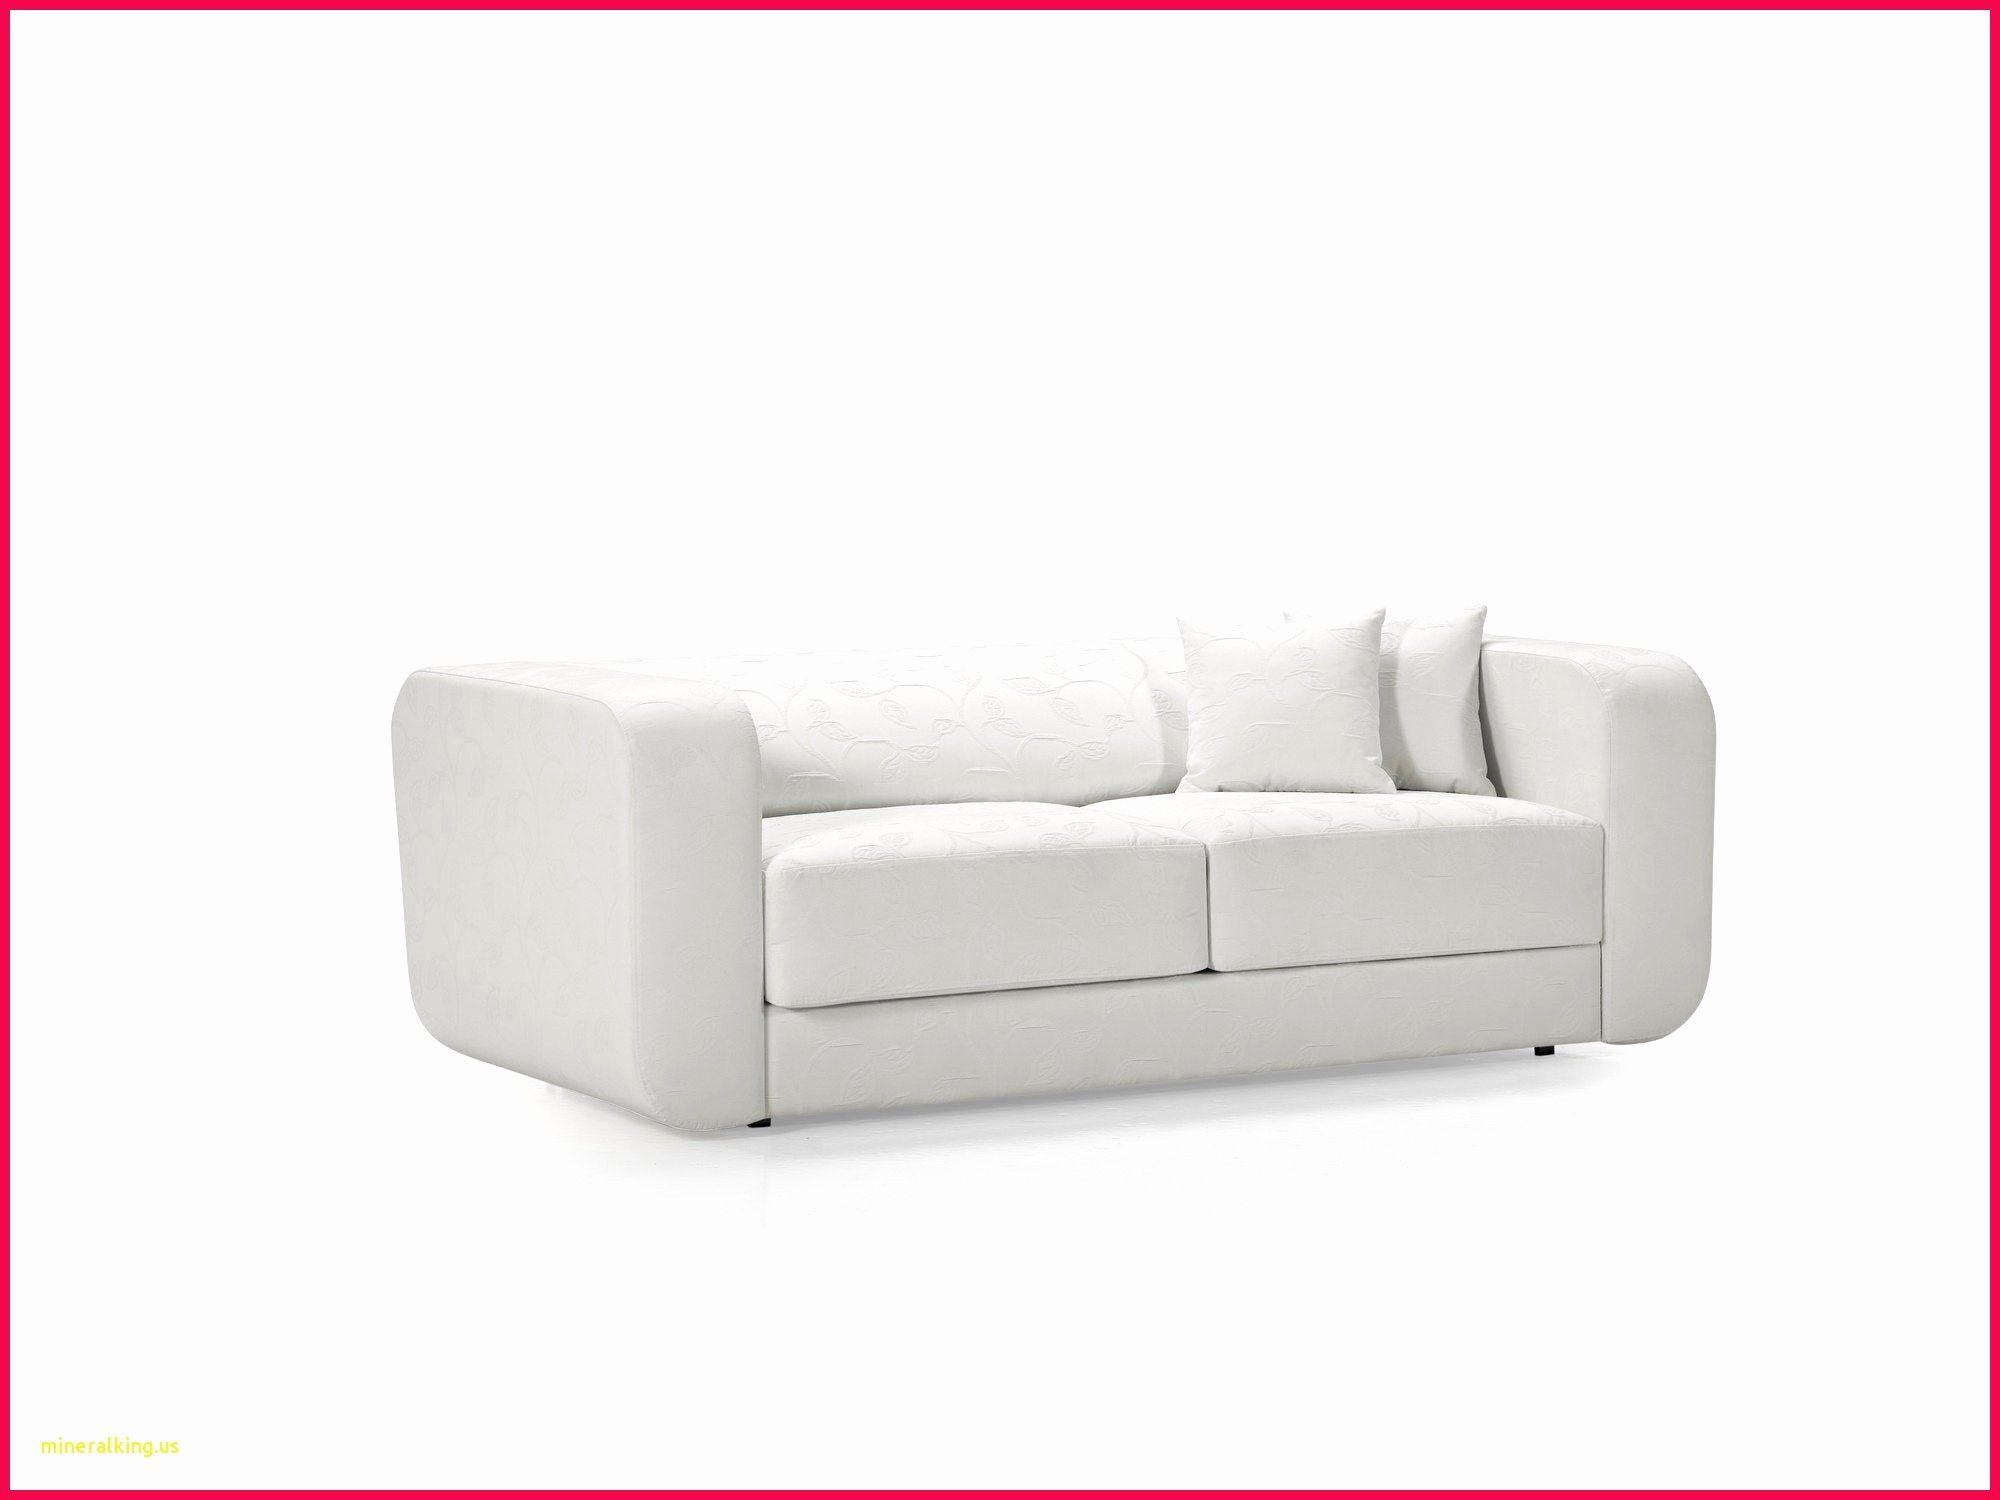 Lit Modulable Ikea Le Luxe Banquette Lit Ikea Inspirant Interior 50 Inspirational Ikea sofa